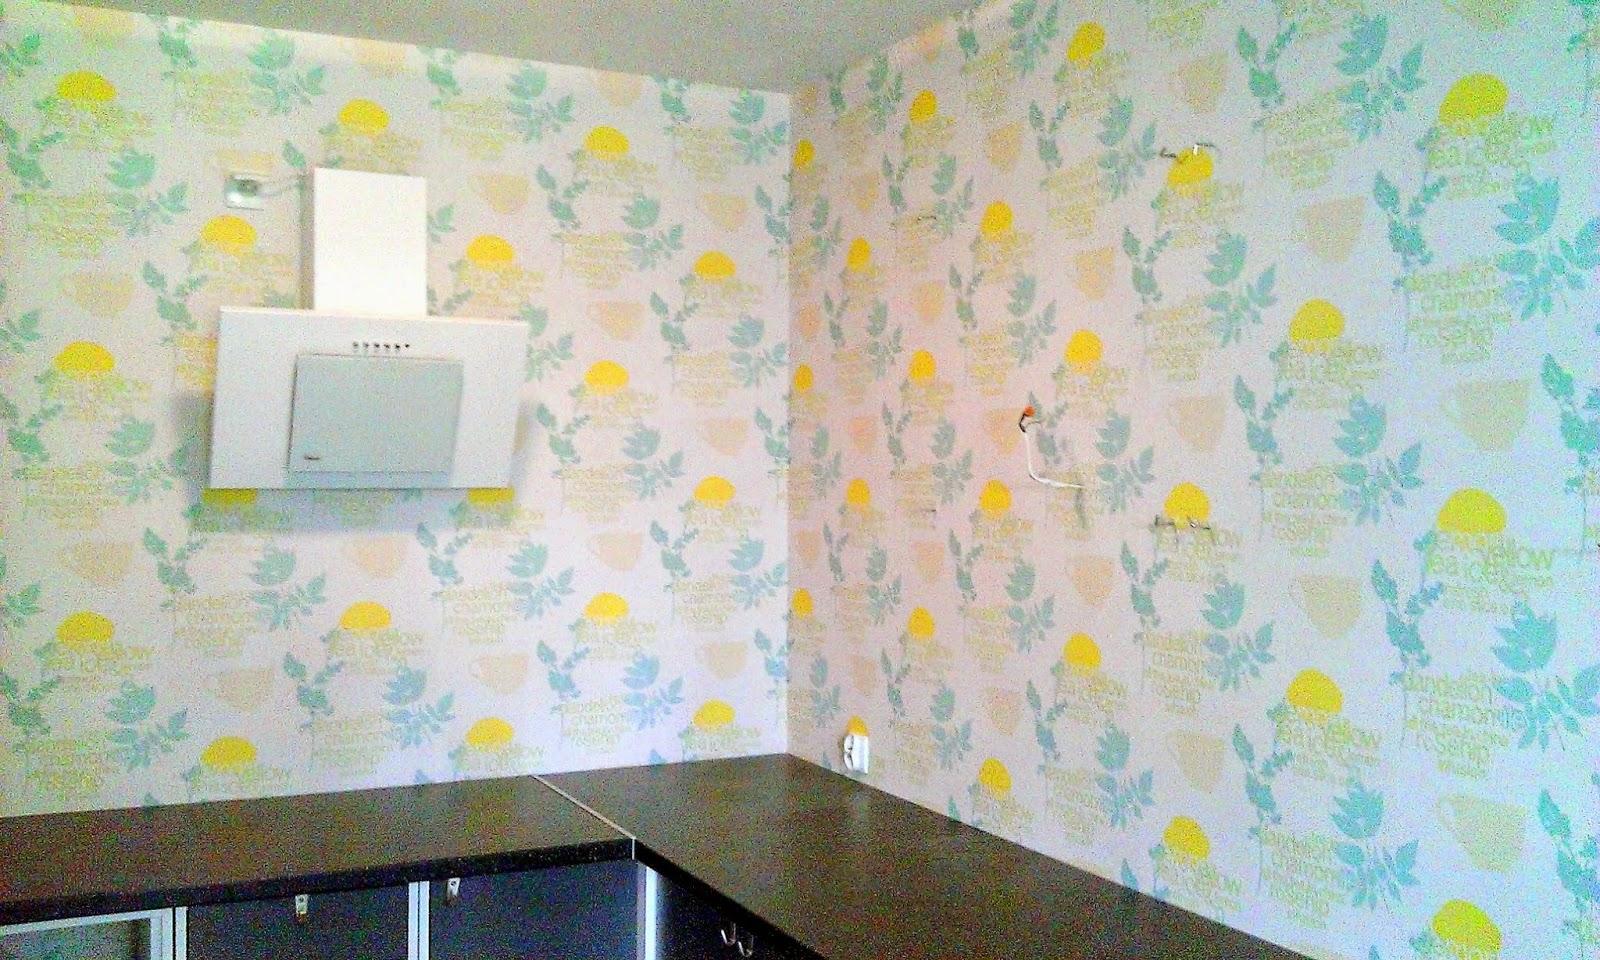 montaż tapety z klejem do kuchni